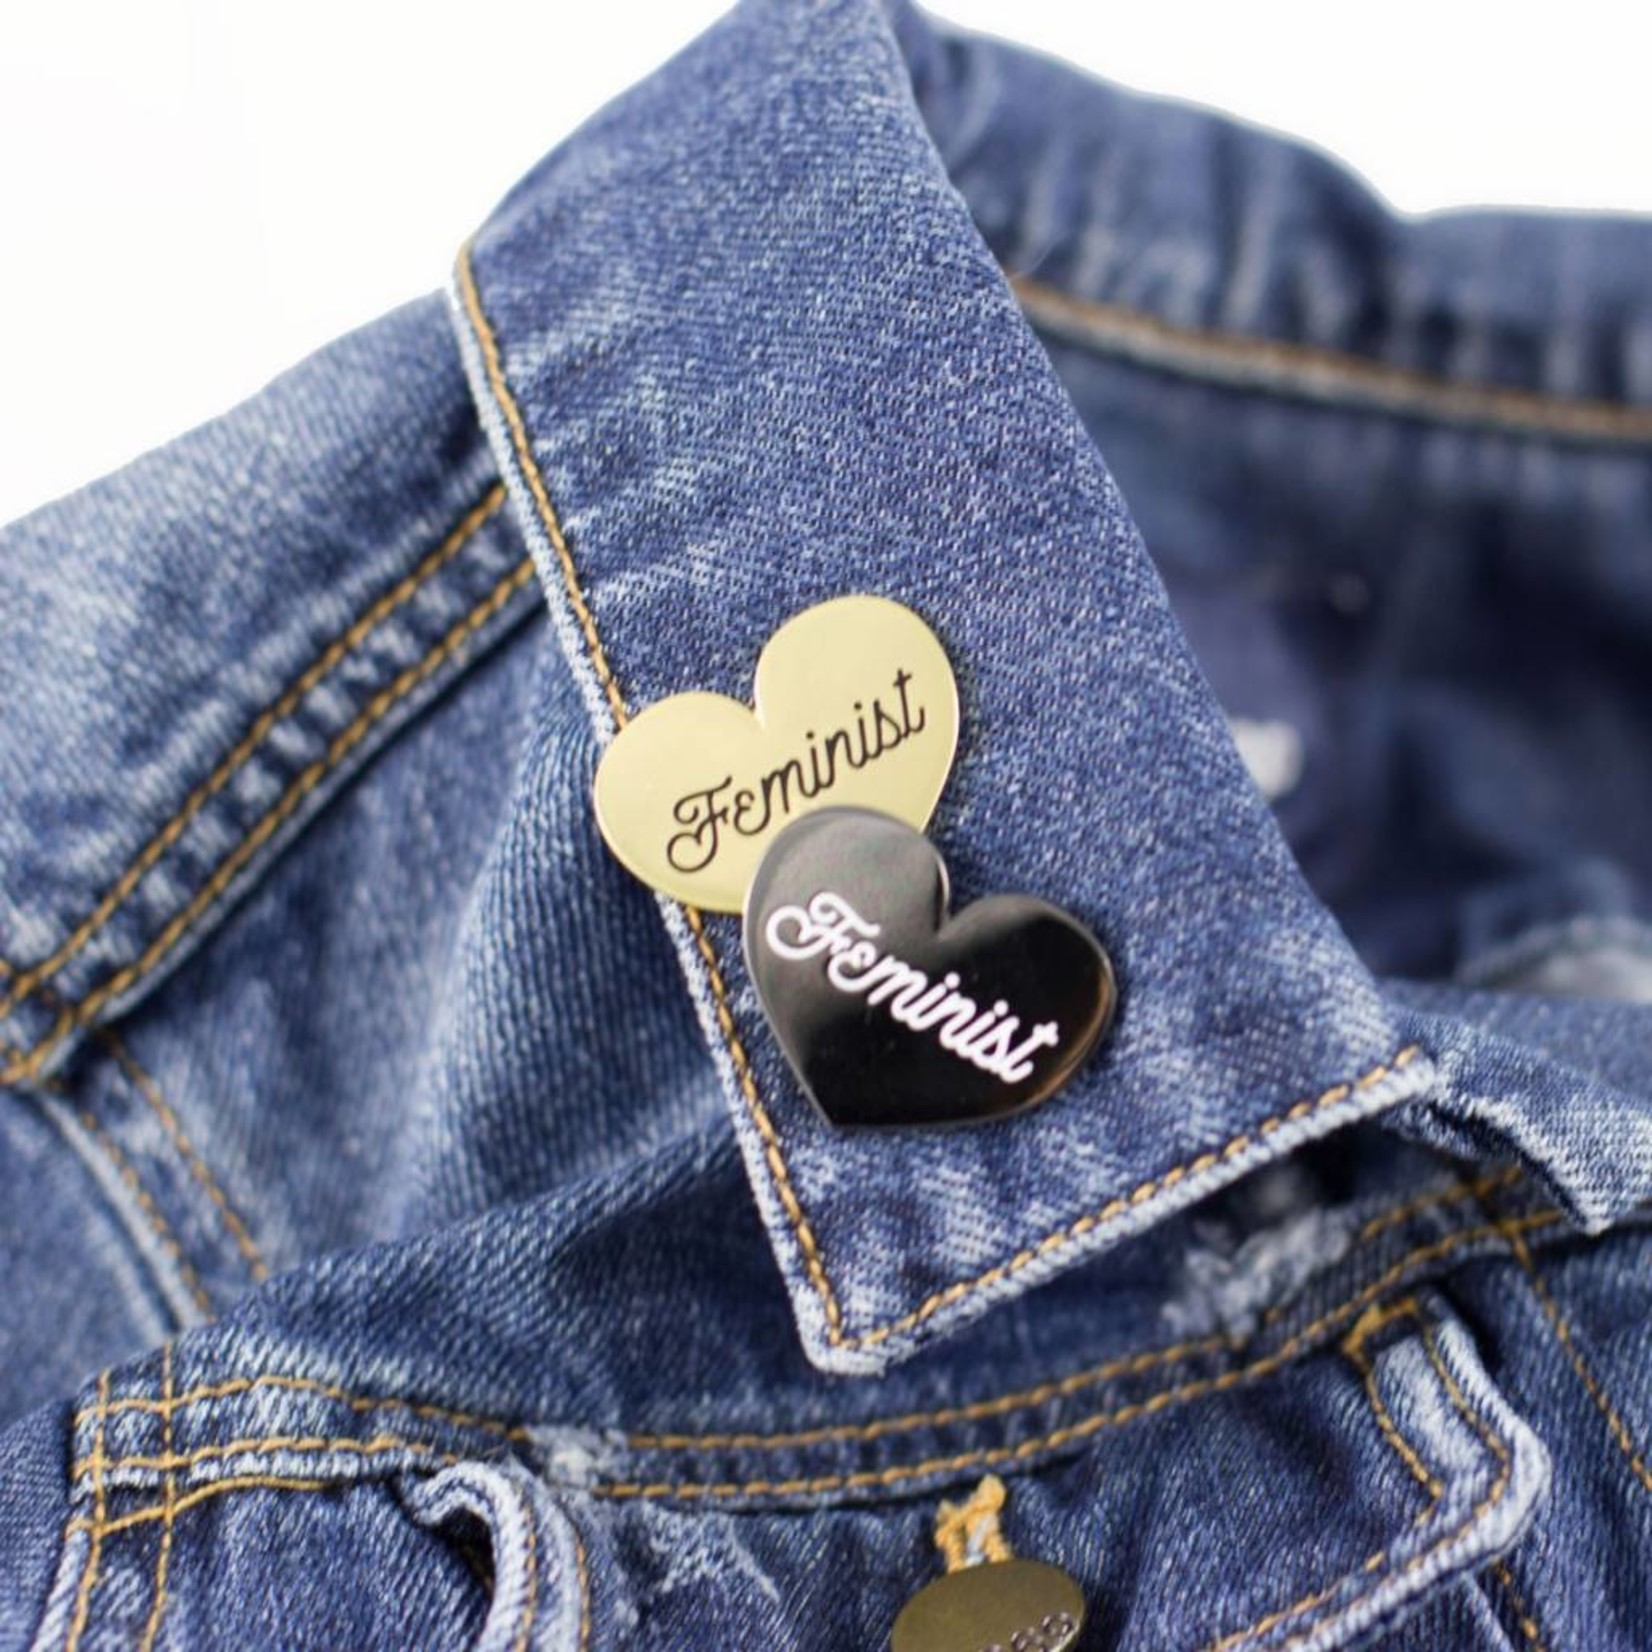 1606 / Sunset Avenue Ceramics Feminist Heart Enamel Pins